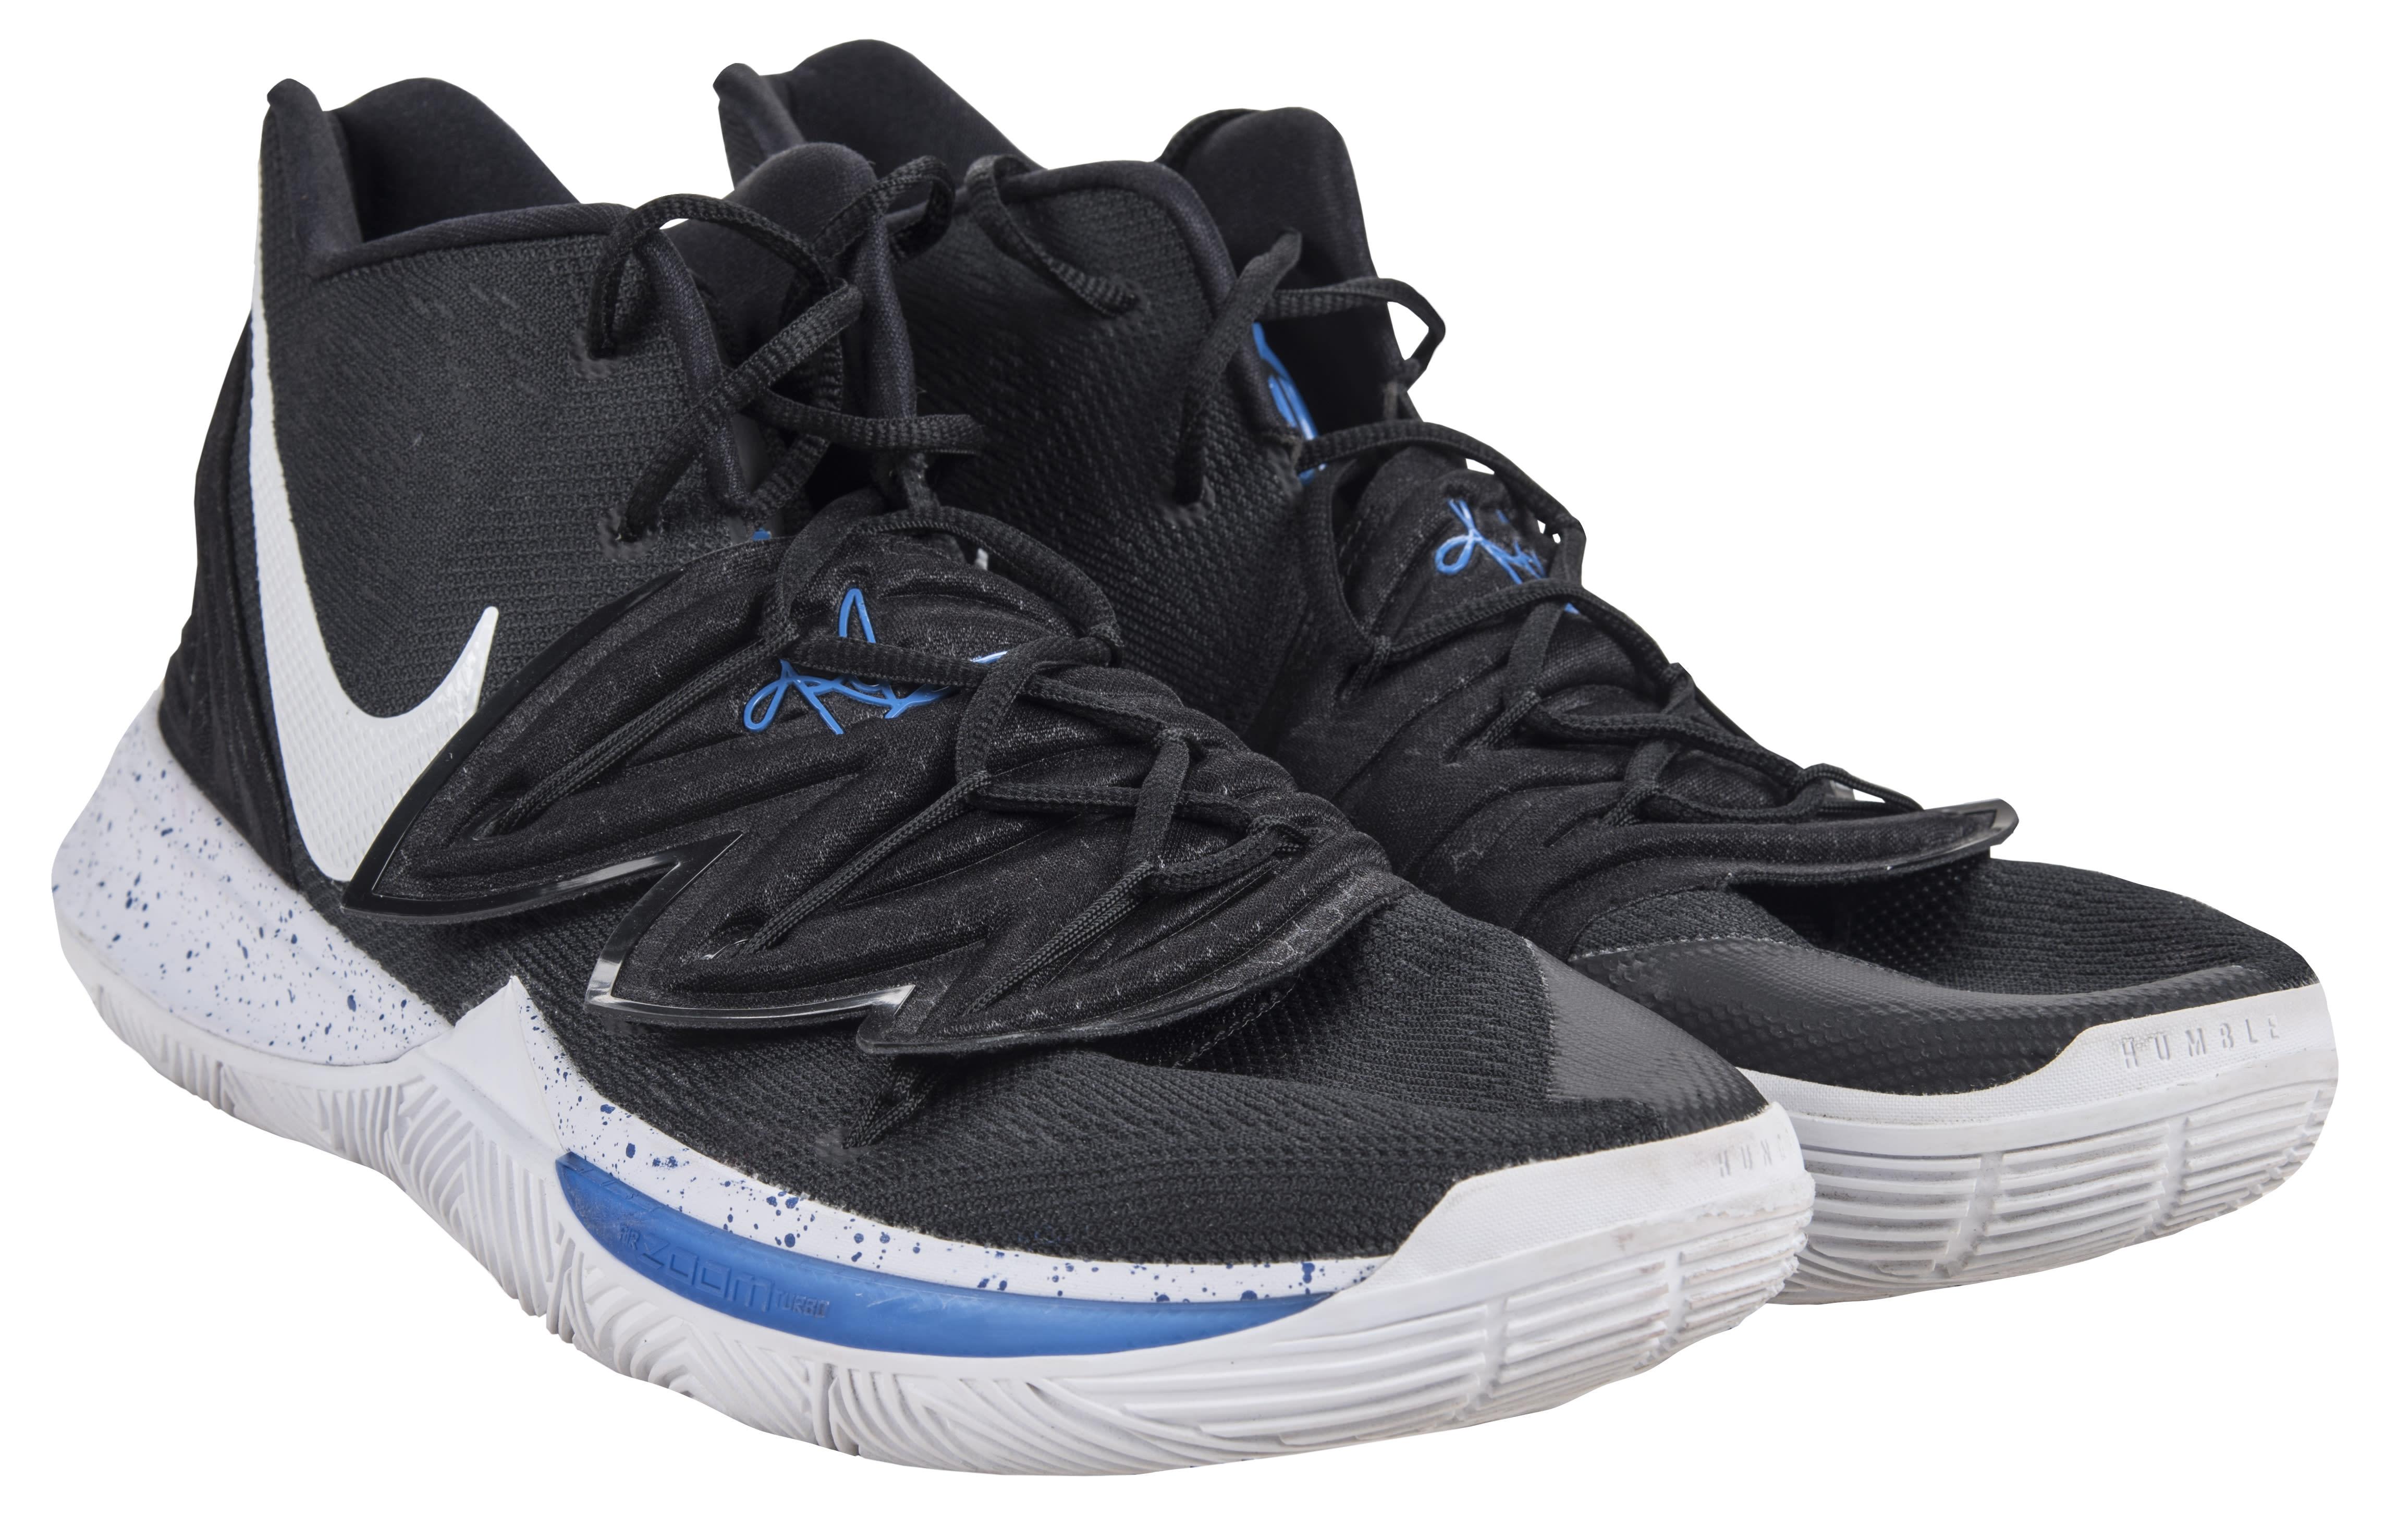 Zion Williamson Nike Kyrie 5 Auction